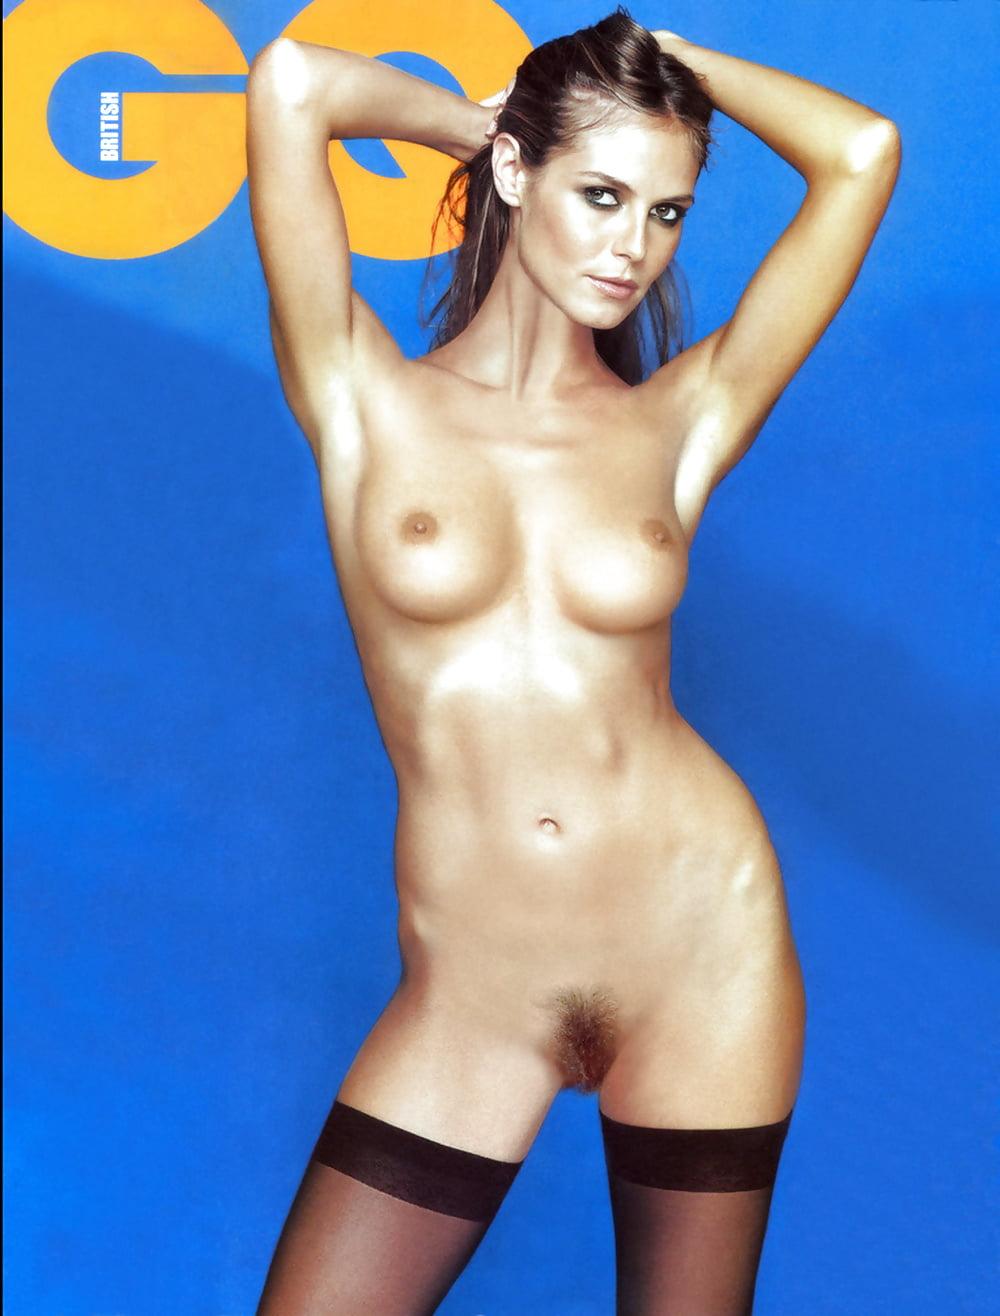 sex-heidi-klum-nude-photos-masturbating-woman-sexiest